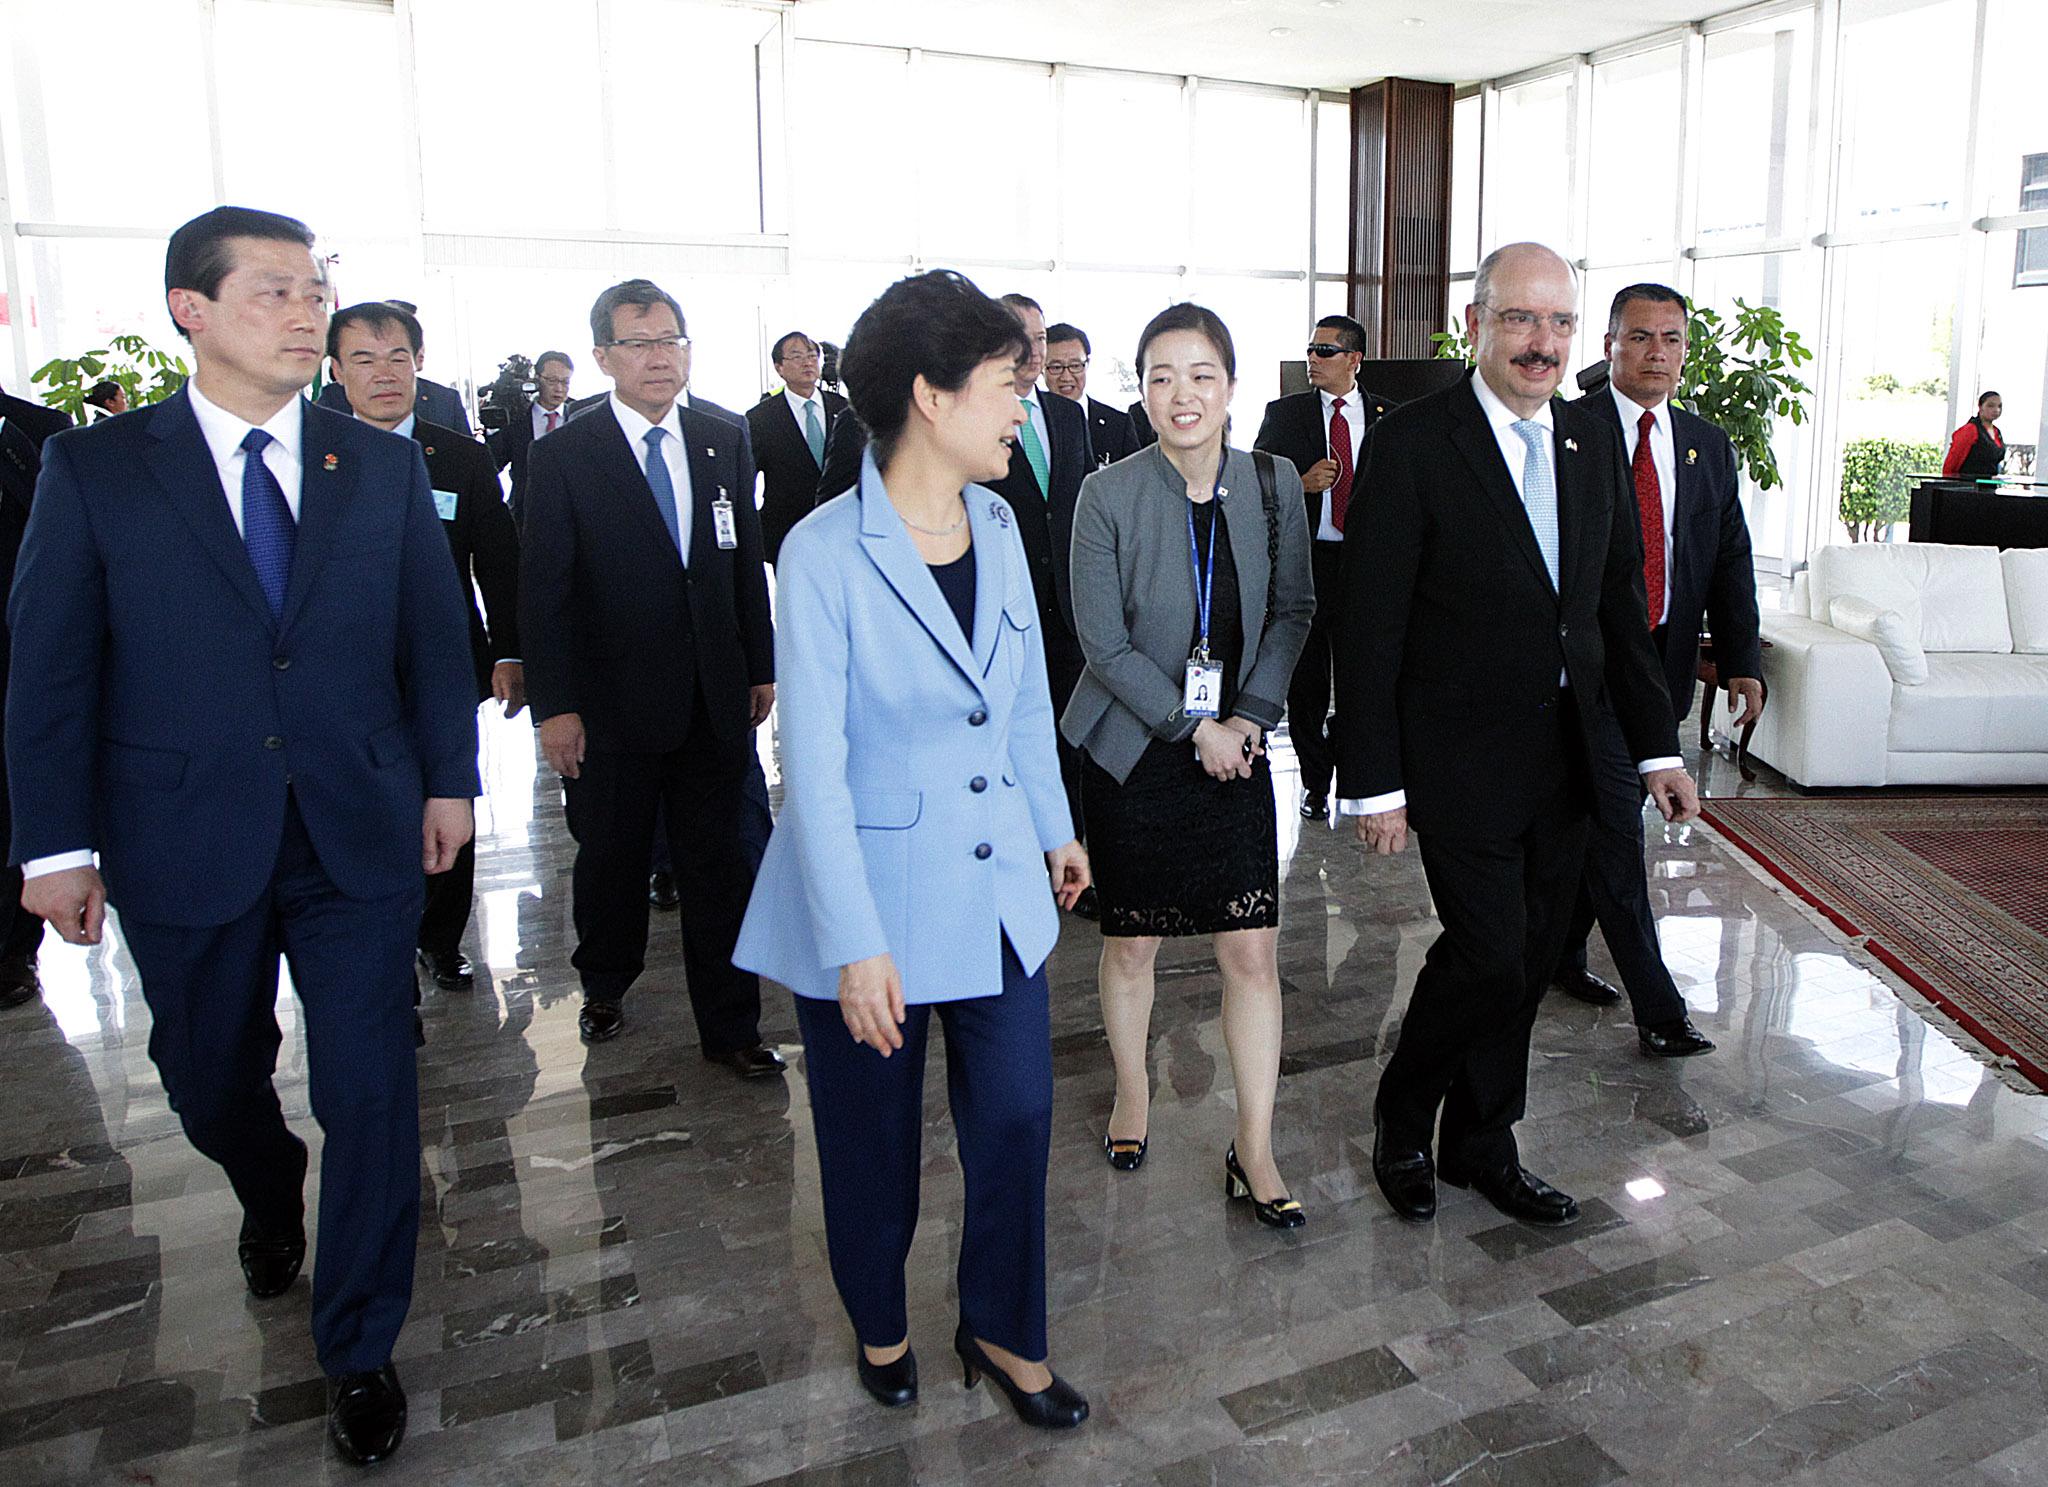 fOTO 4 Arribo de la Presidenta de la Rep blica de Corea  Excma. Sra. Park Geun hye.jpg